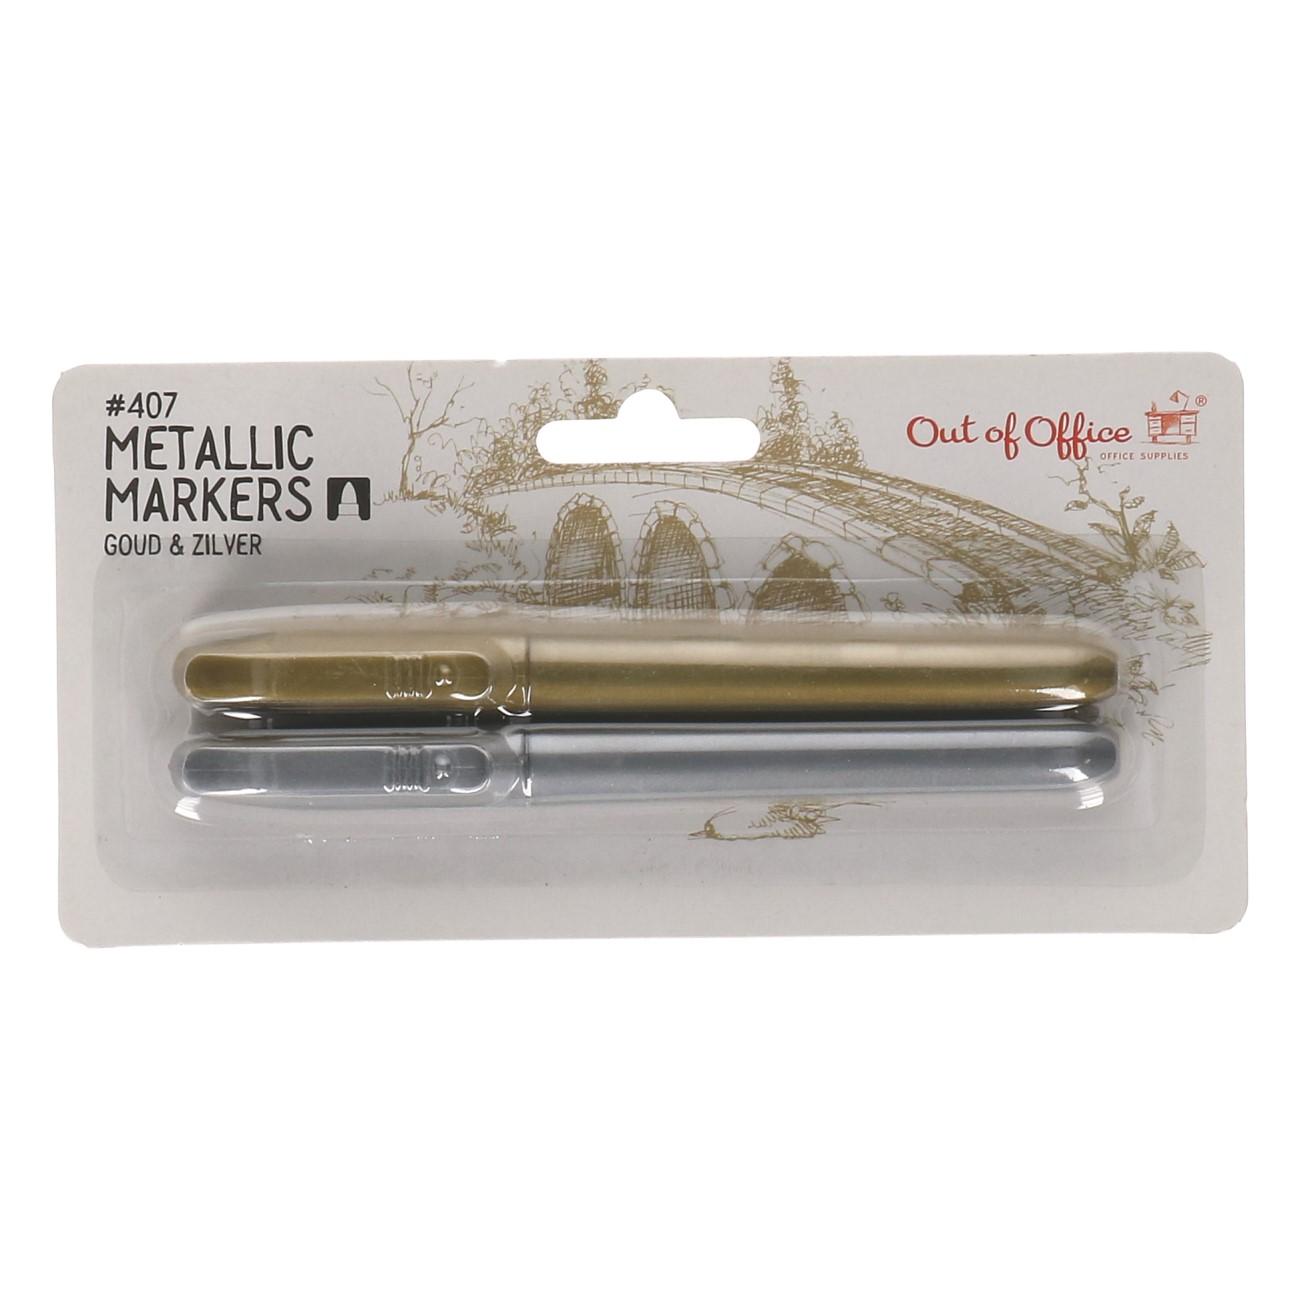 Metallic markers 2 st. (#407)